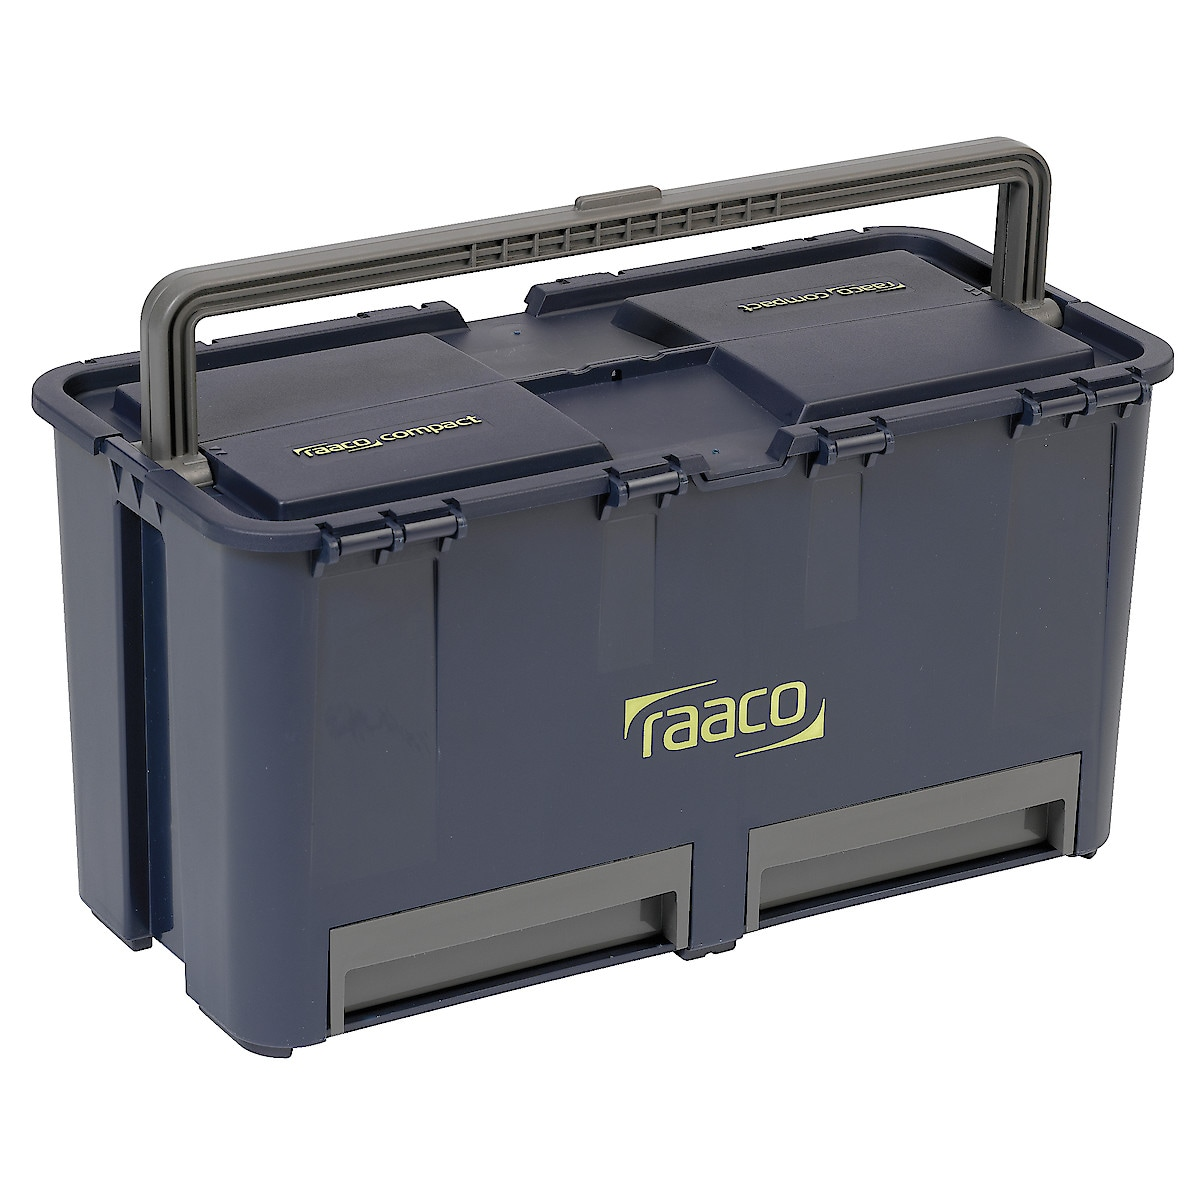 Verktygslåda Compact 27, Raaco